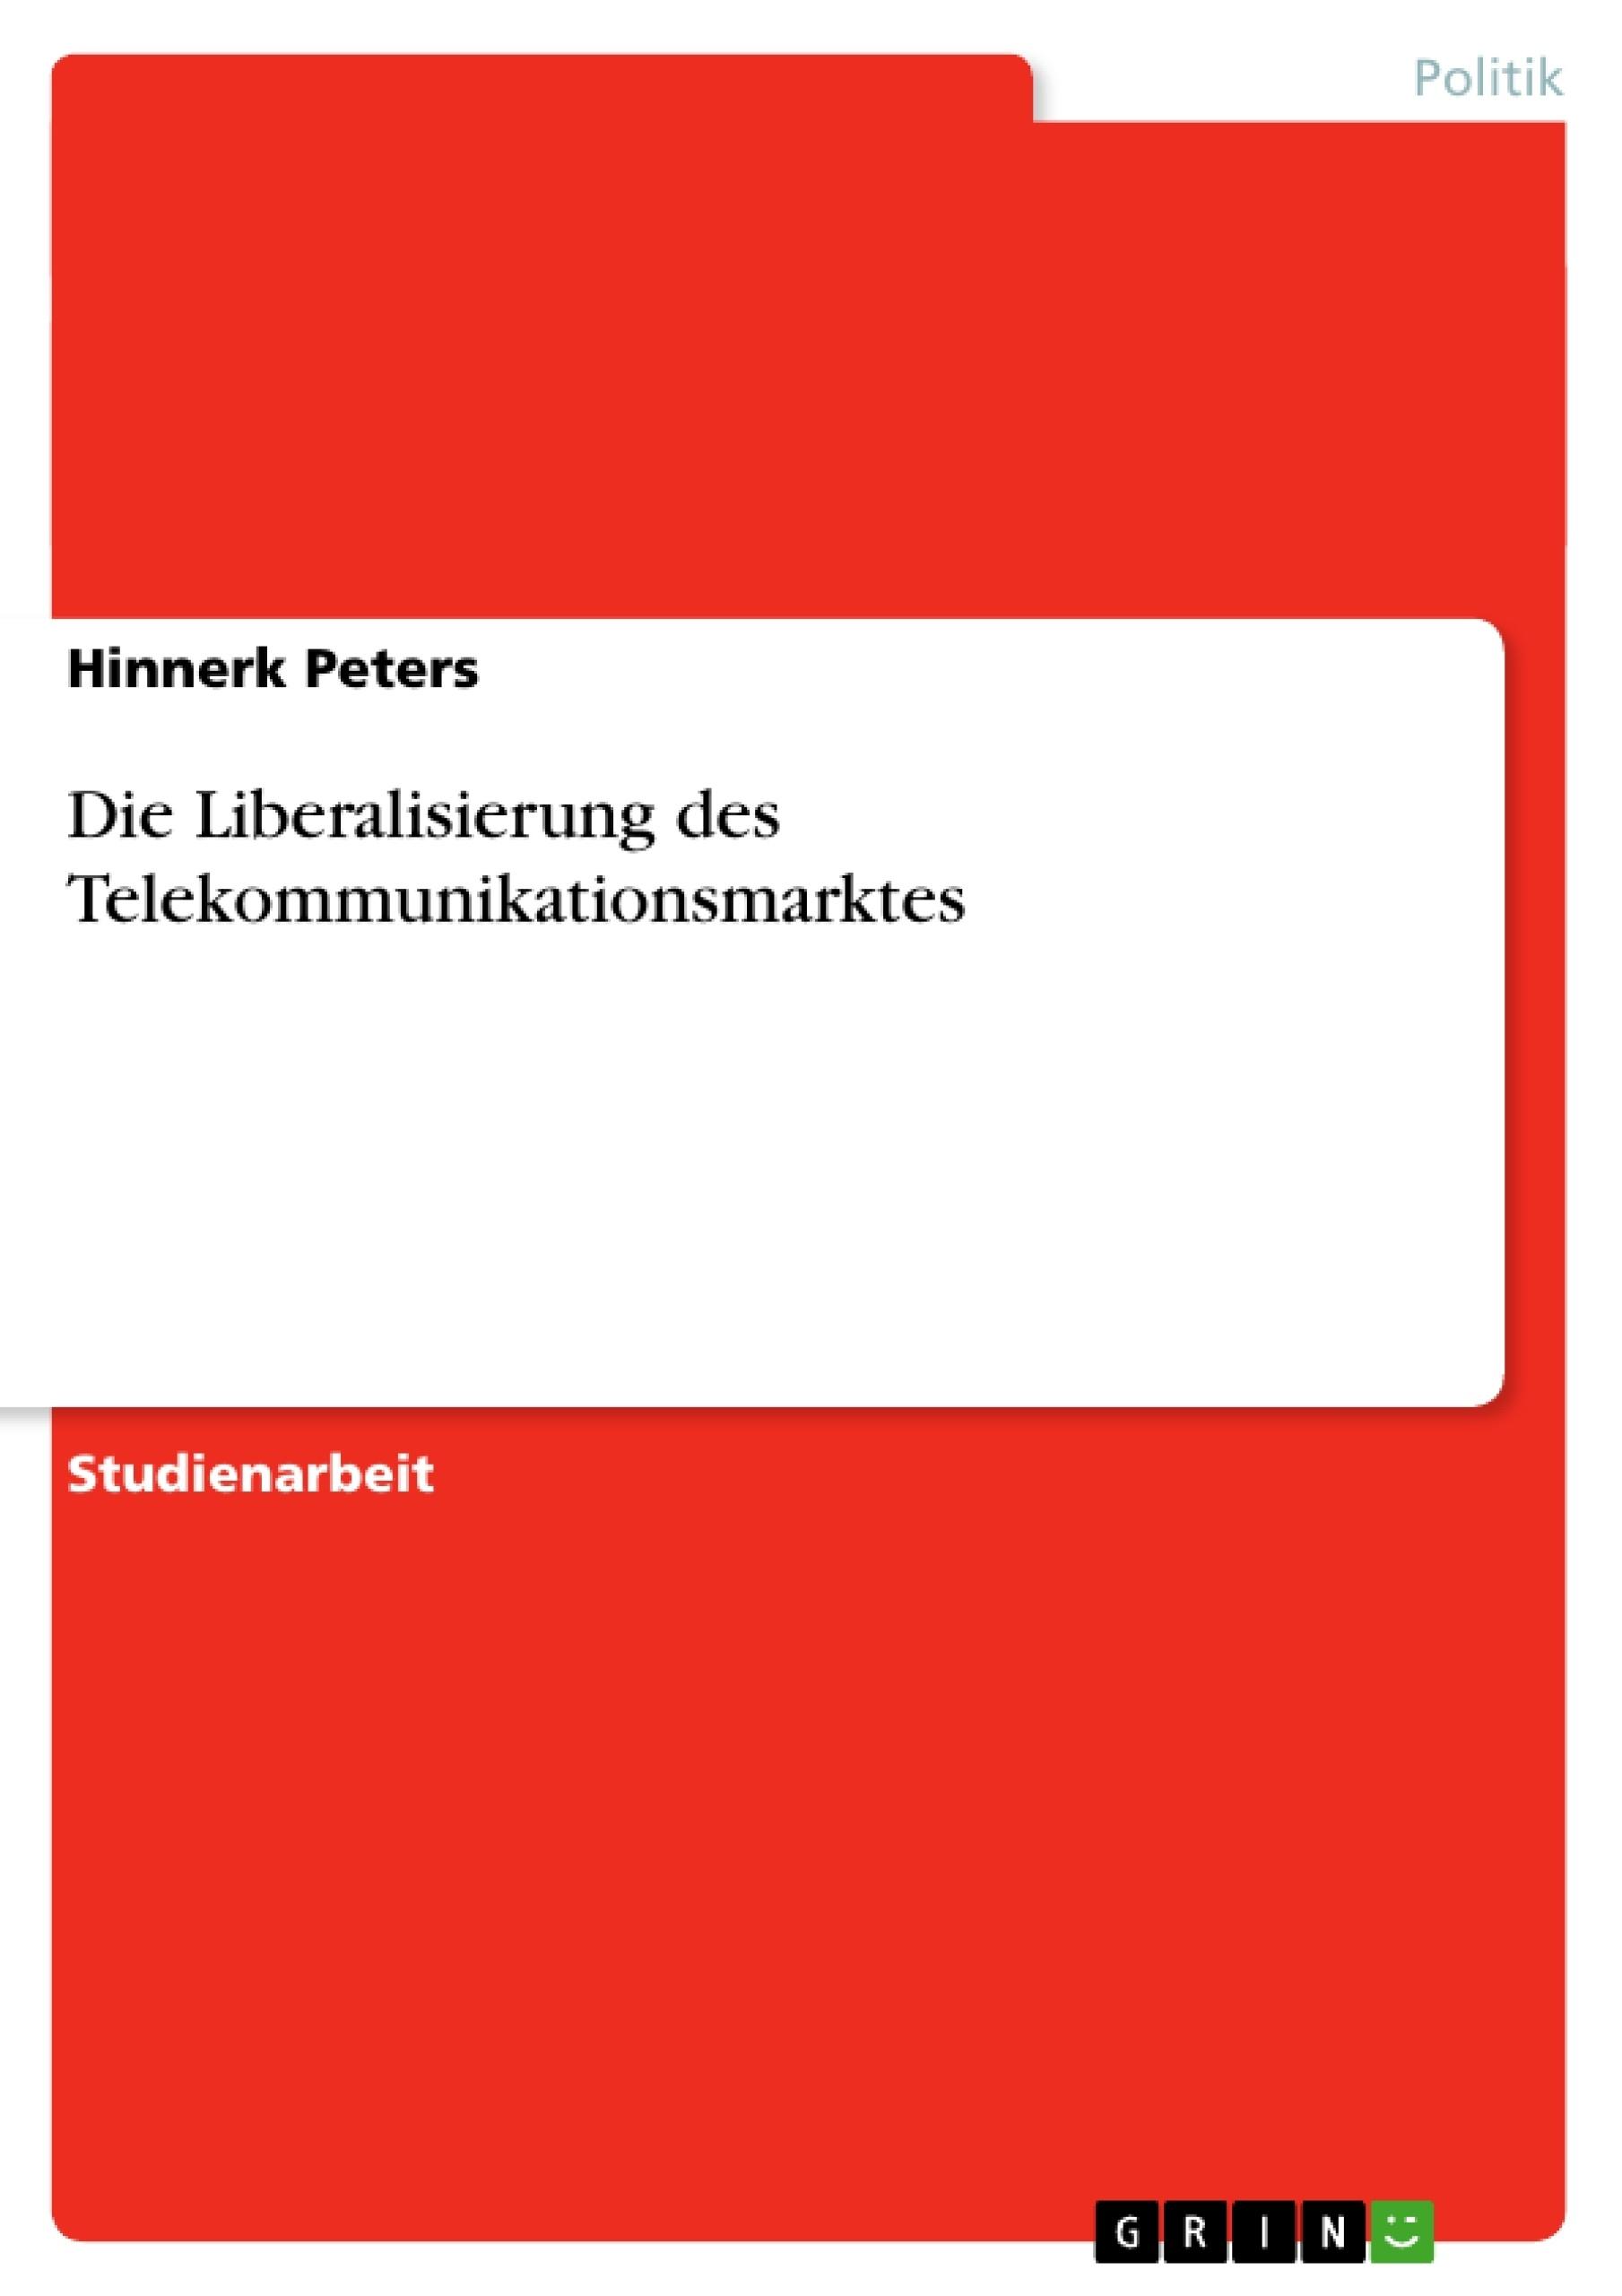 Titel: Die Liberalisierung des Telekommunikationsmarktes